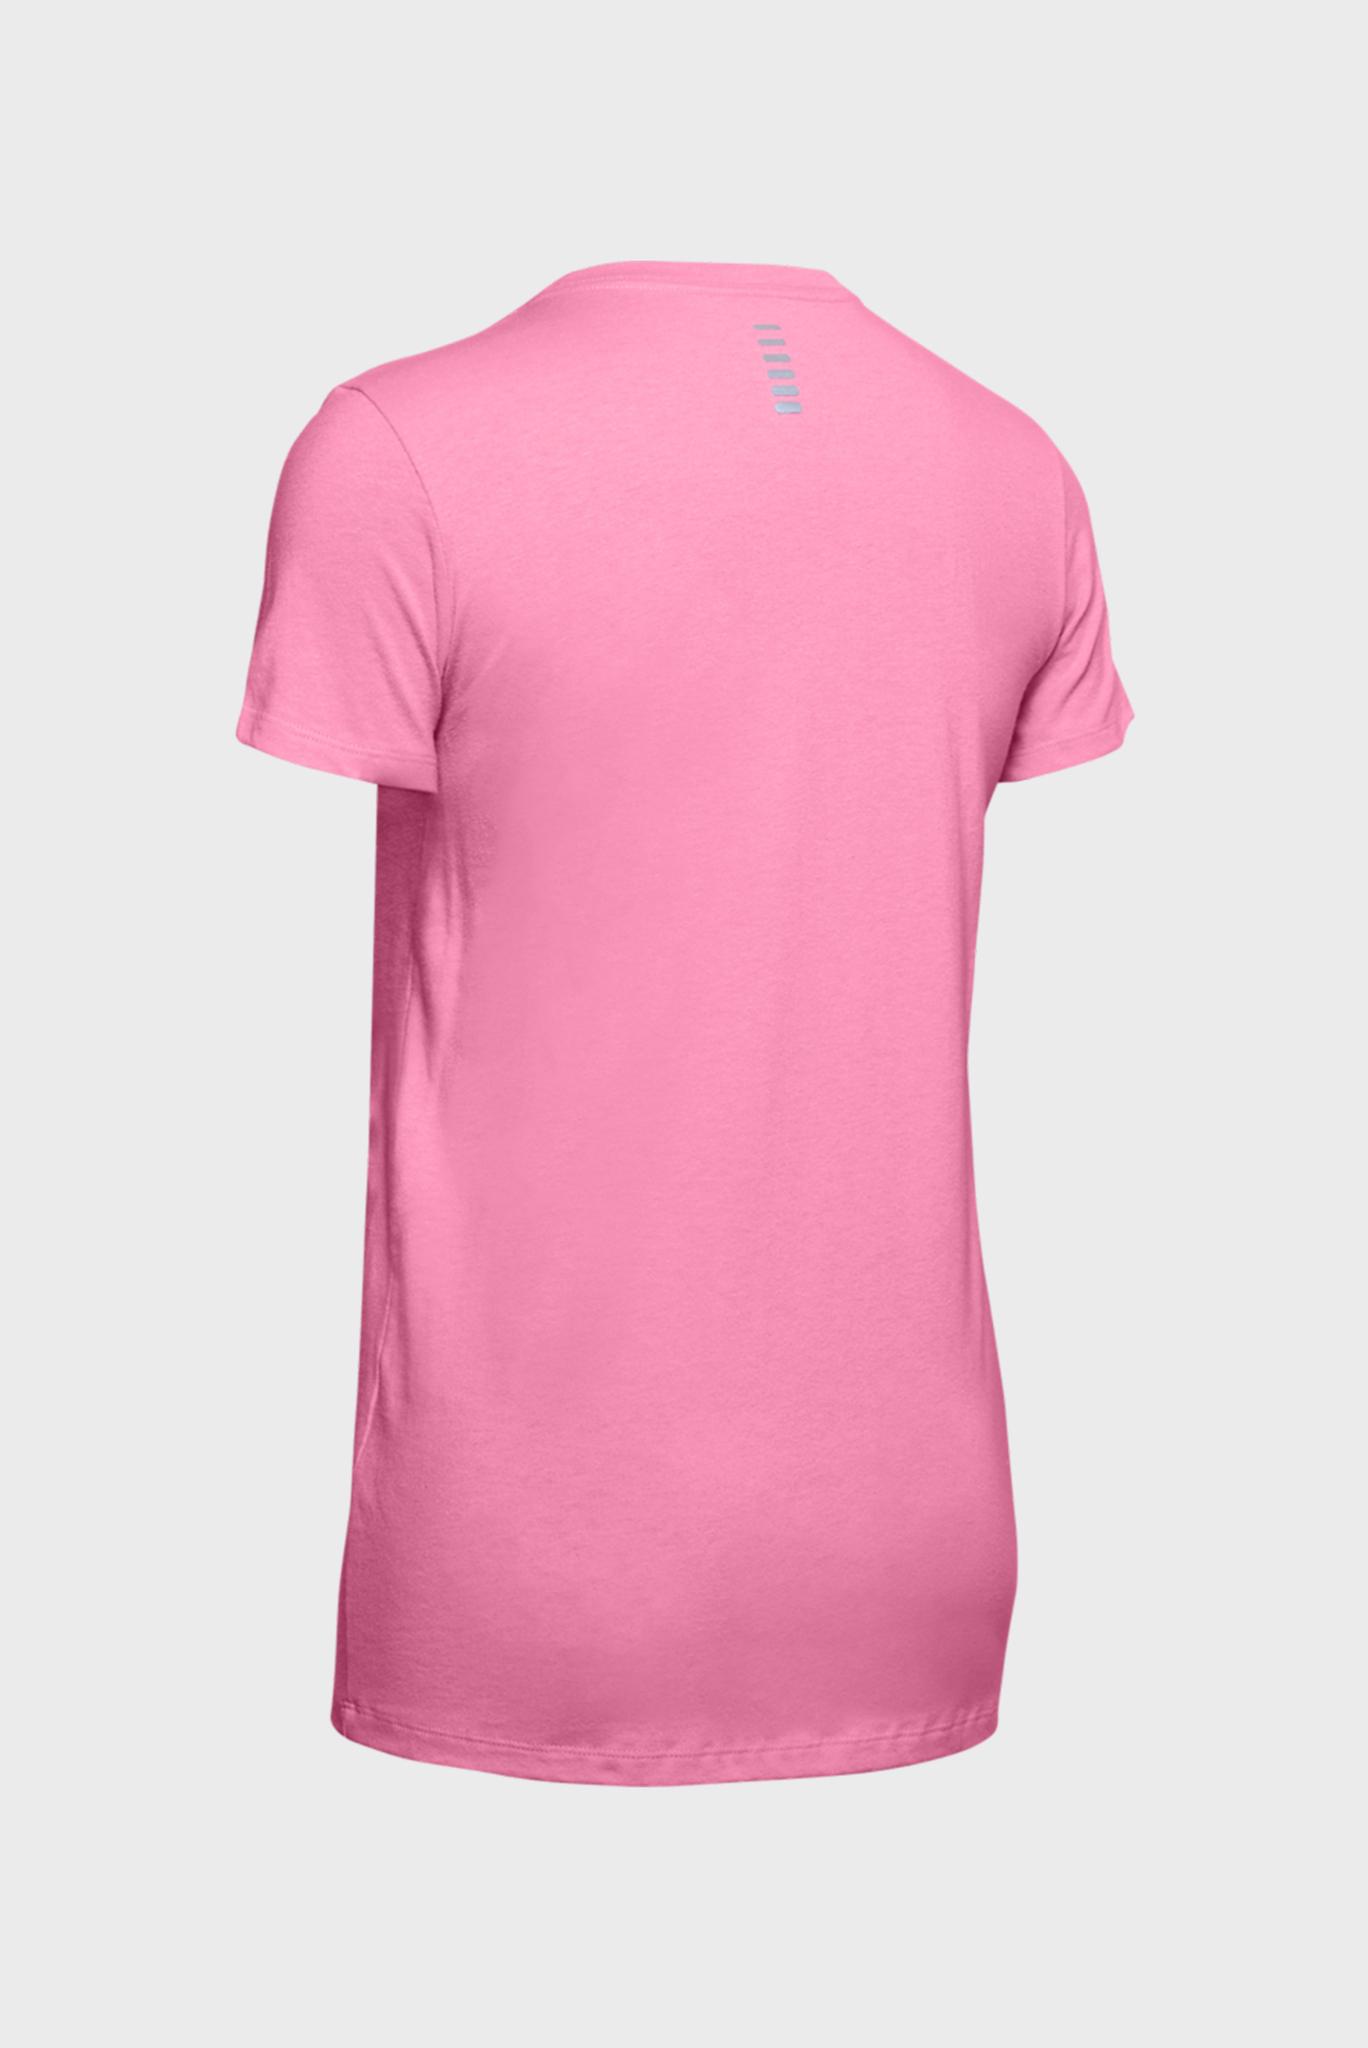 Женская розовая спортивная футболка W UA Love Run Another Short Sleeve Under Armour